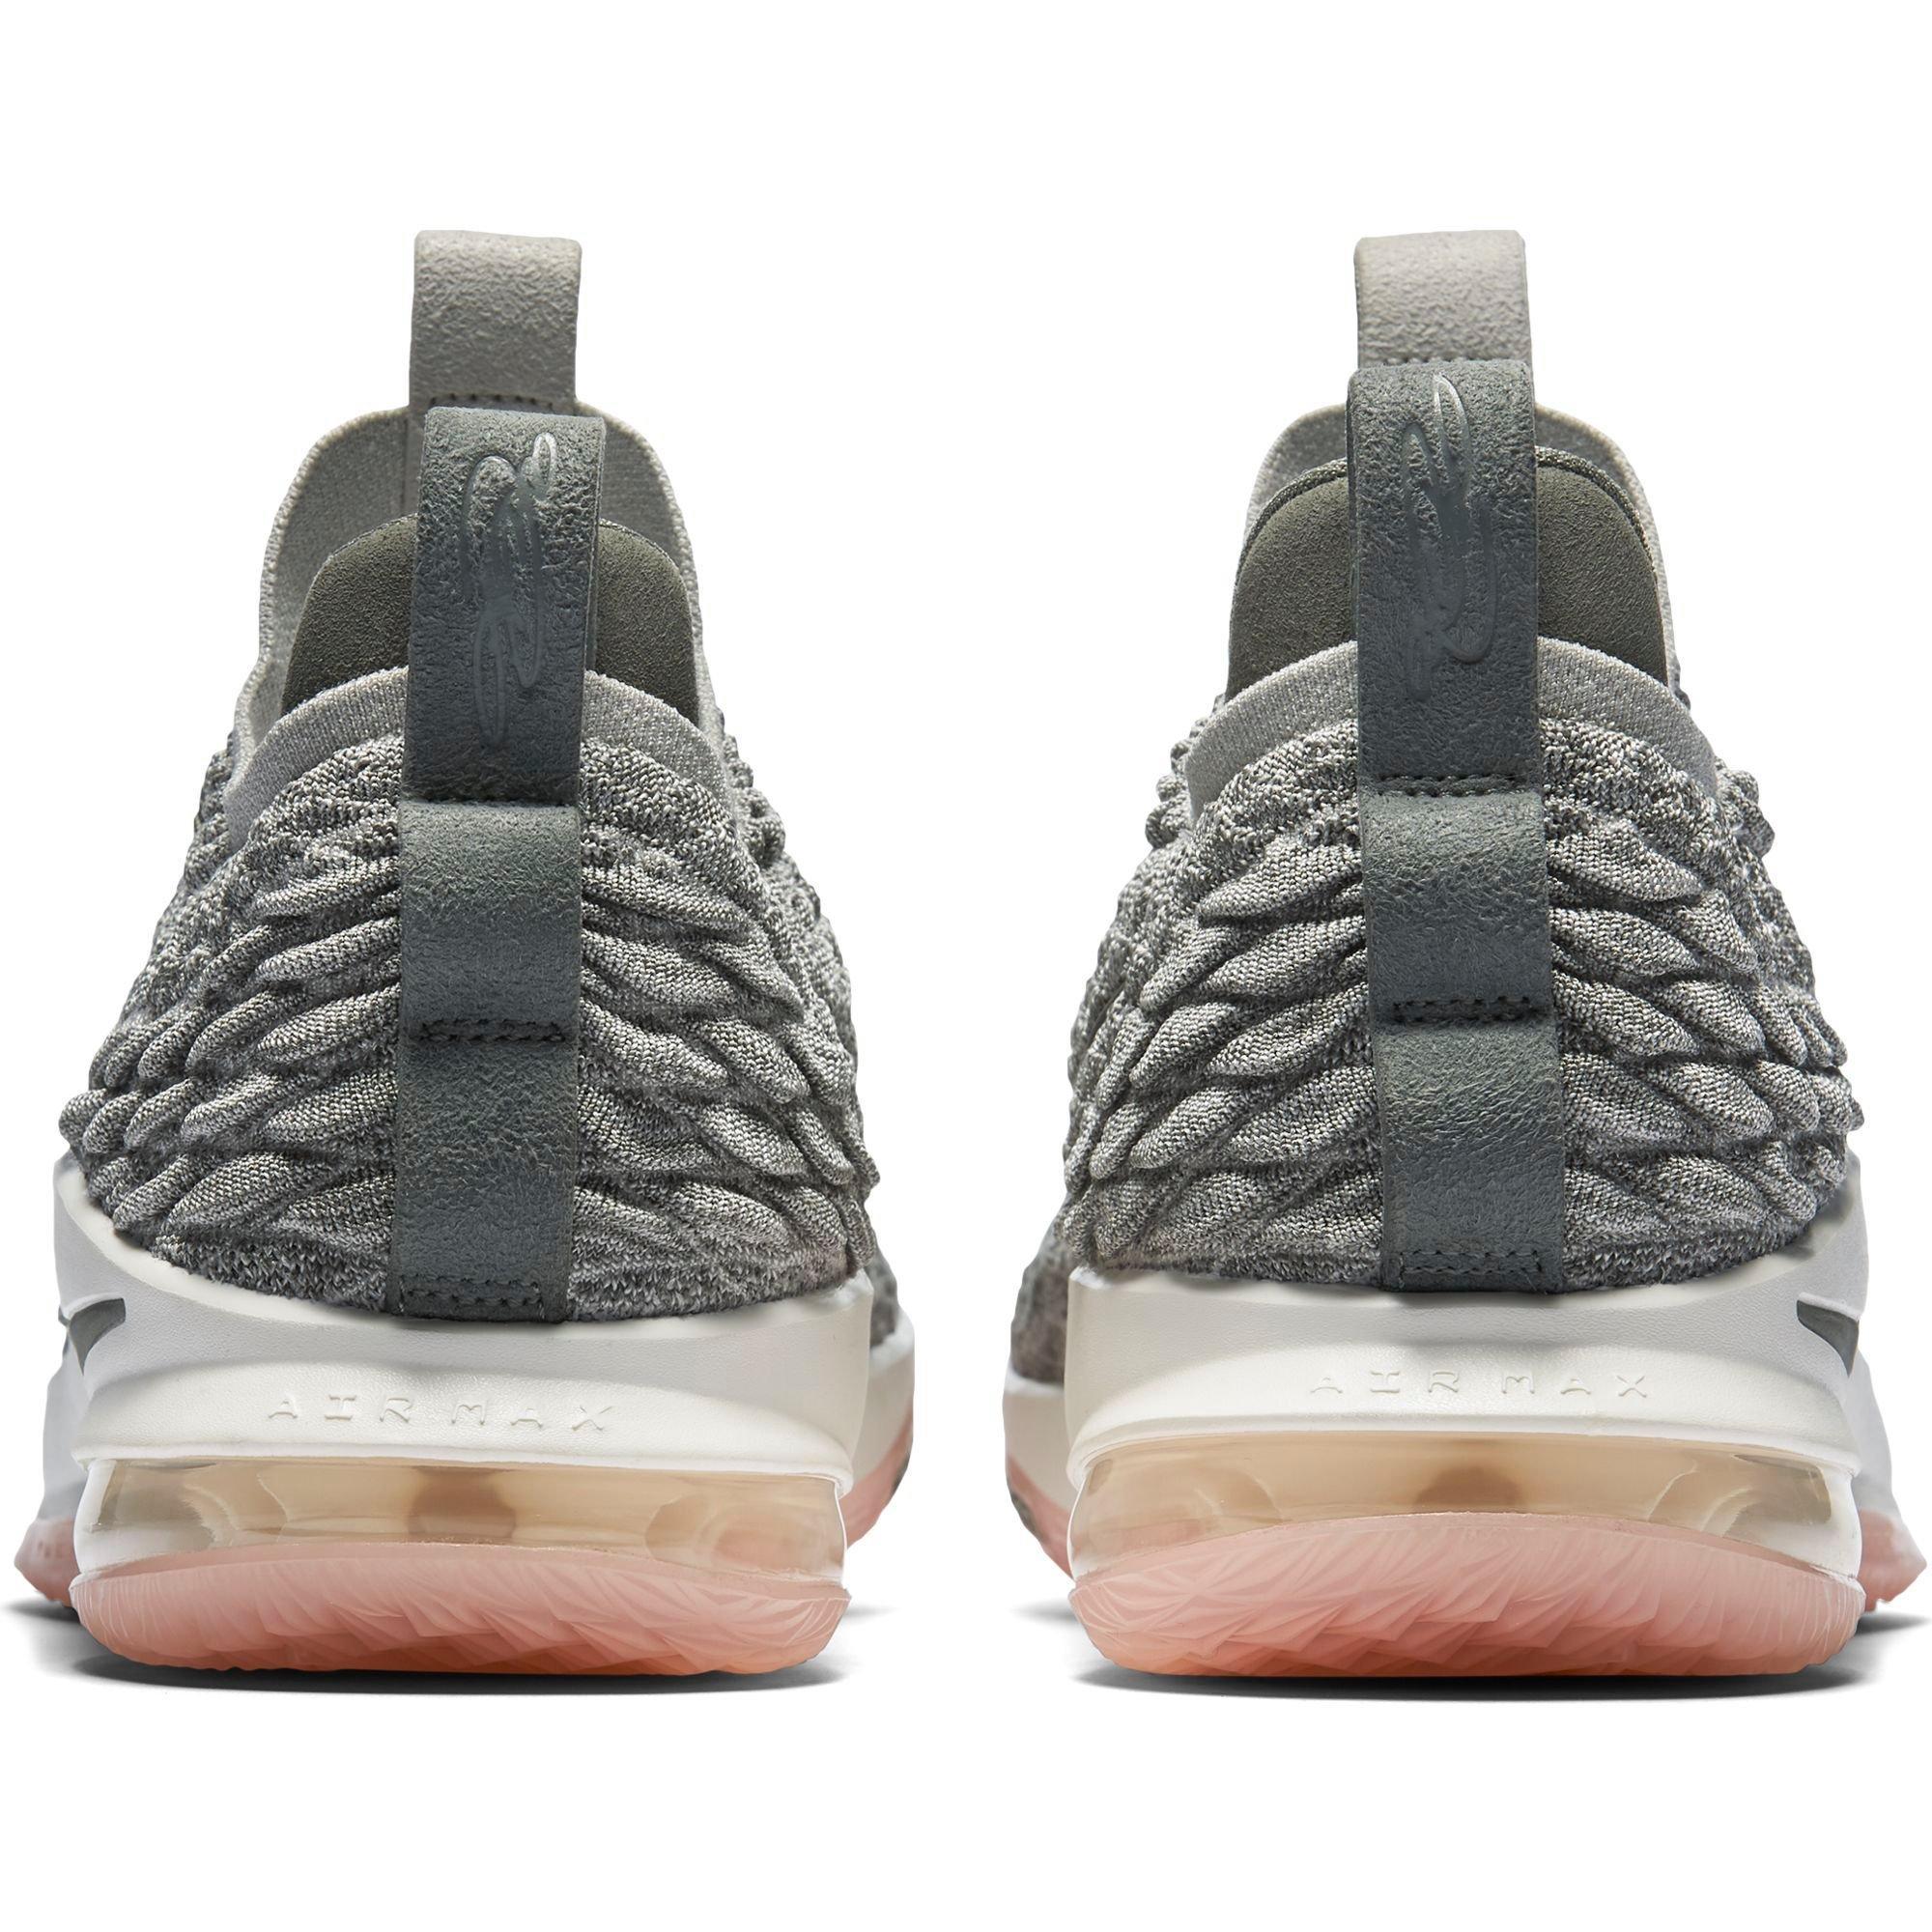 658deff8ded Nike LeBron XV 15 Off White James Men s Basketball Shoes